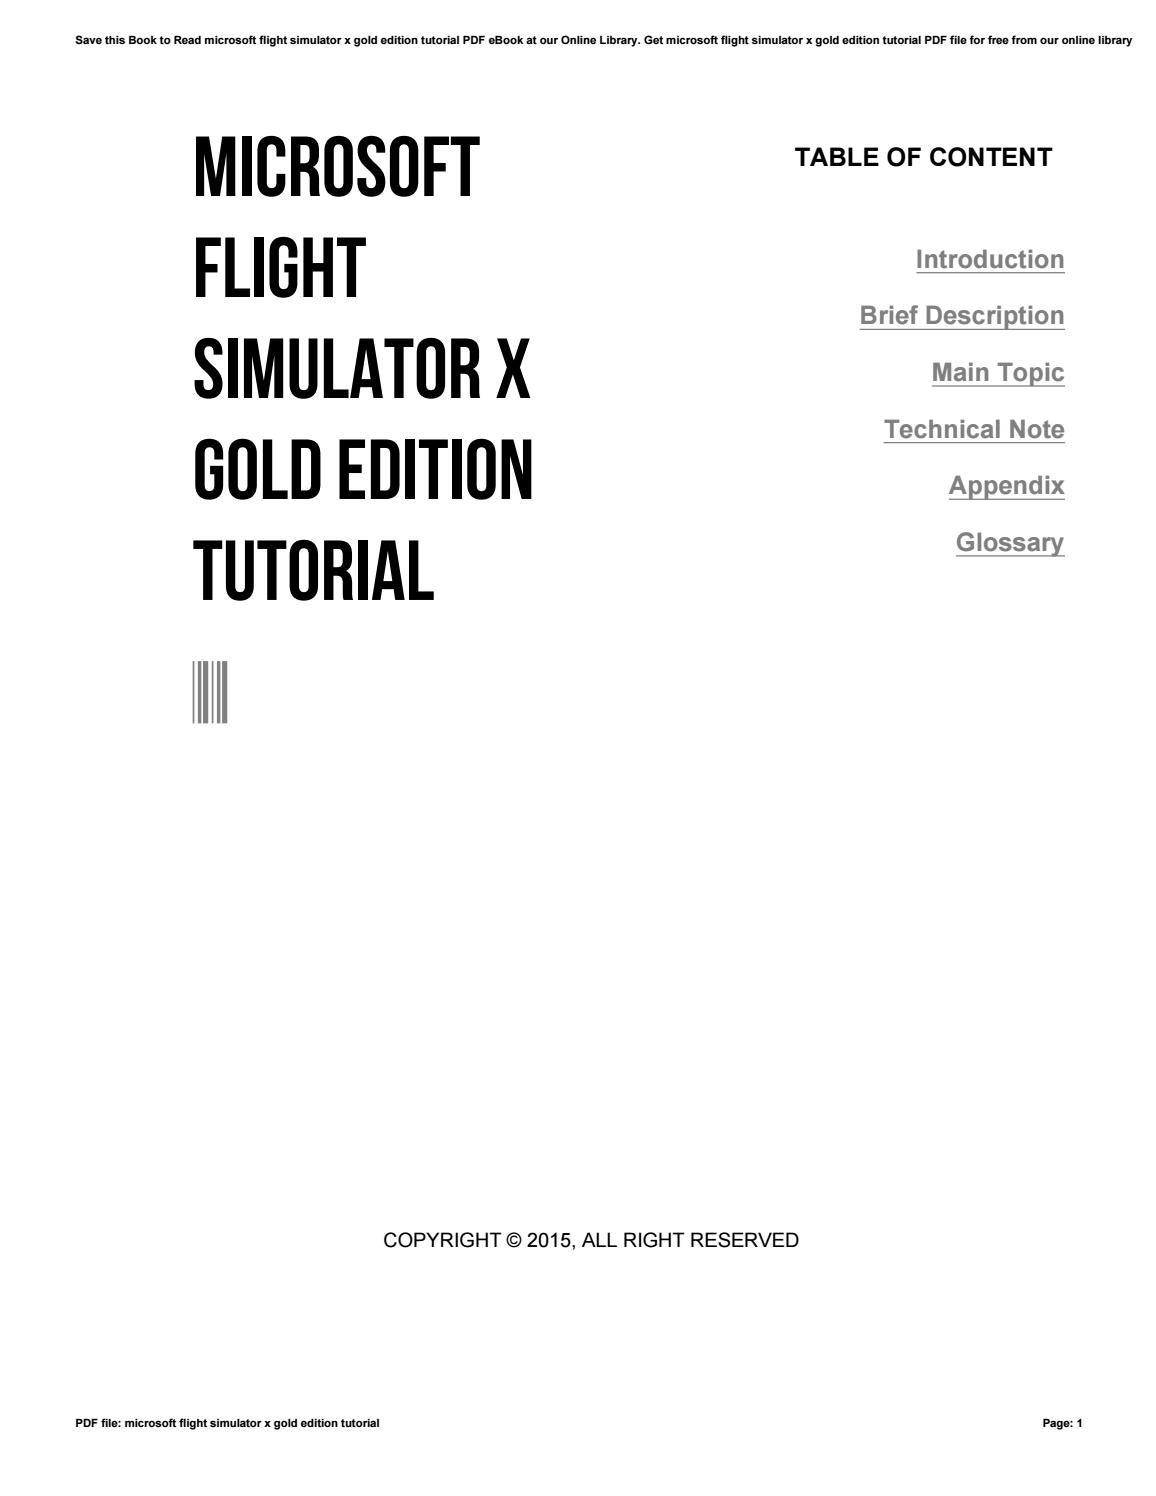 Microsoft flight simulator x downloads & add-ons.